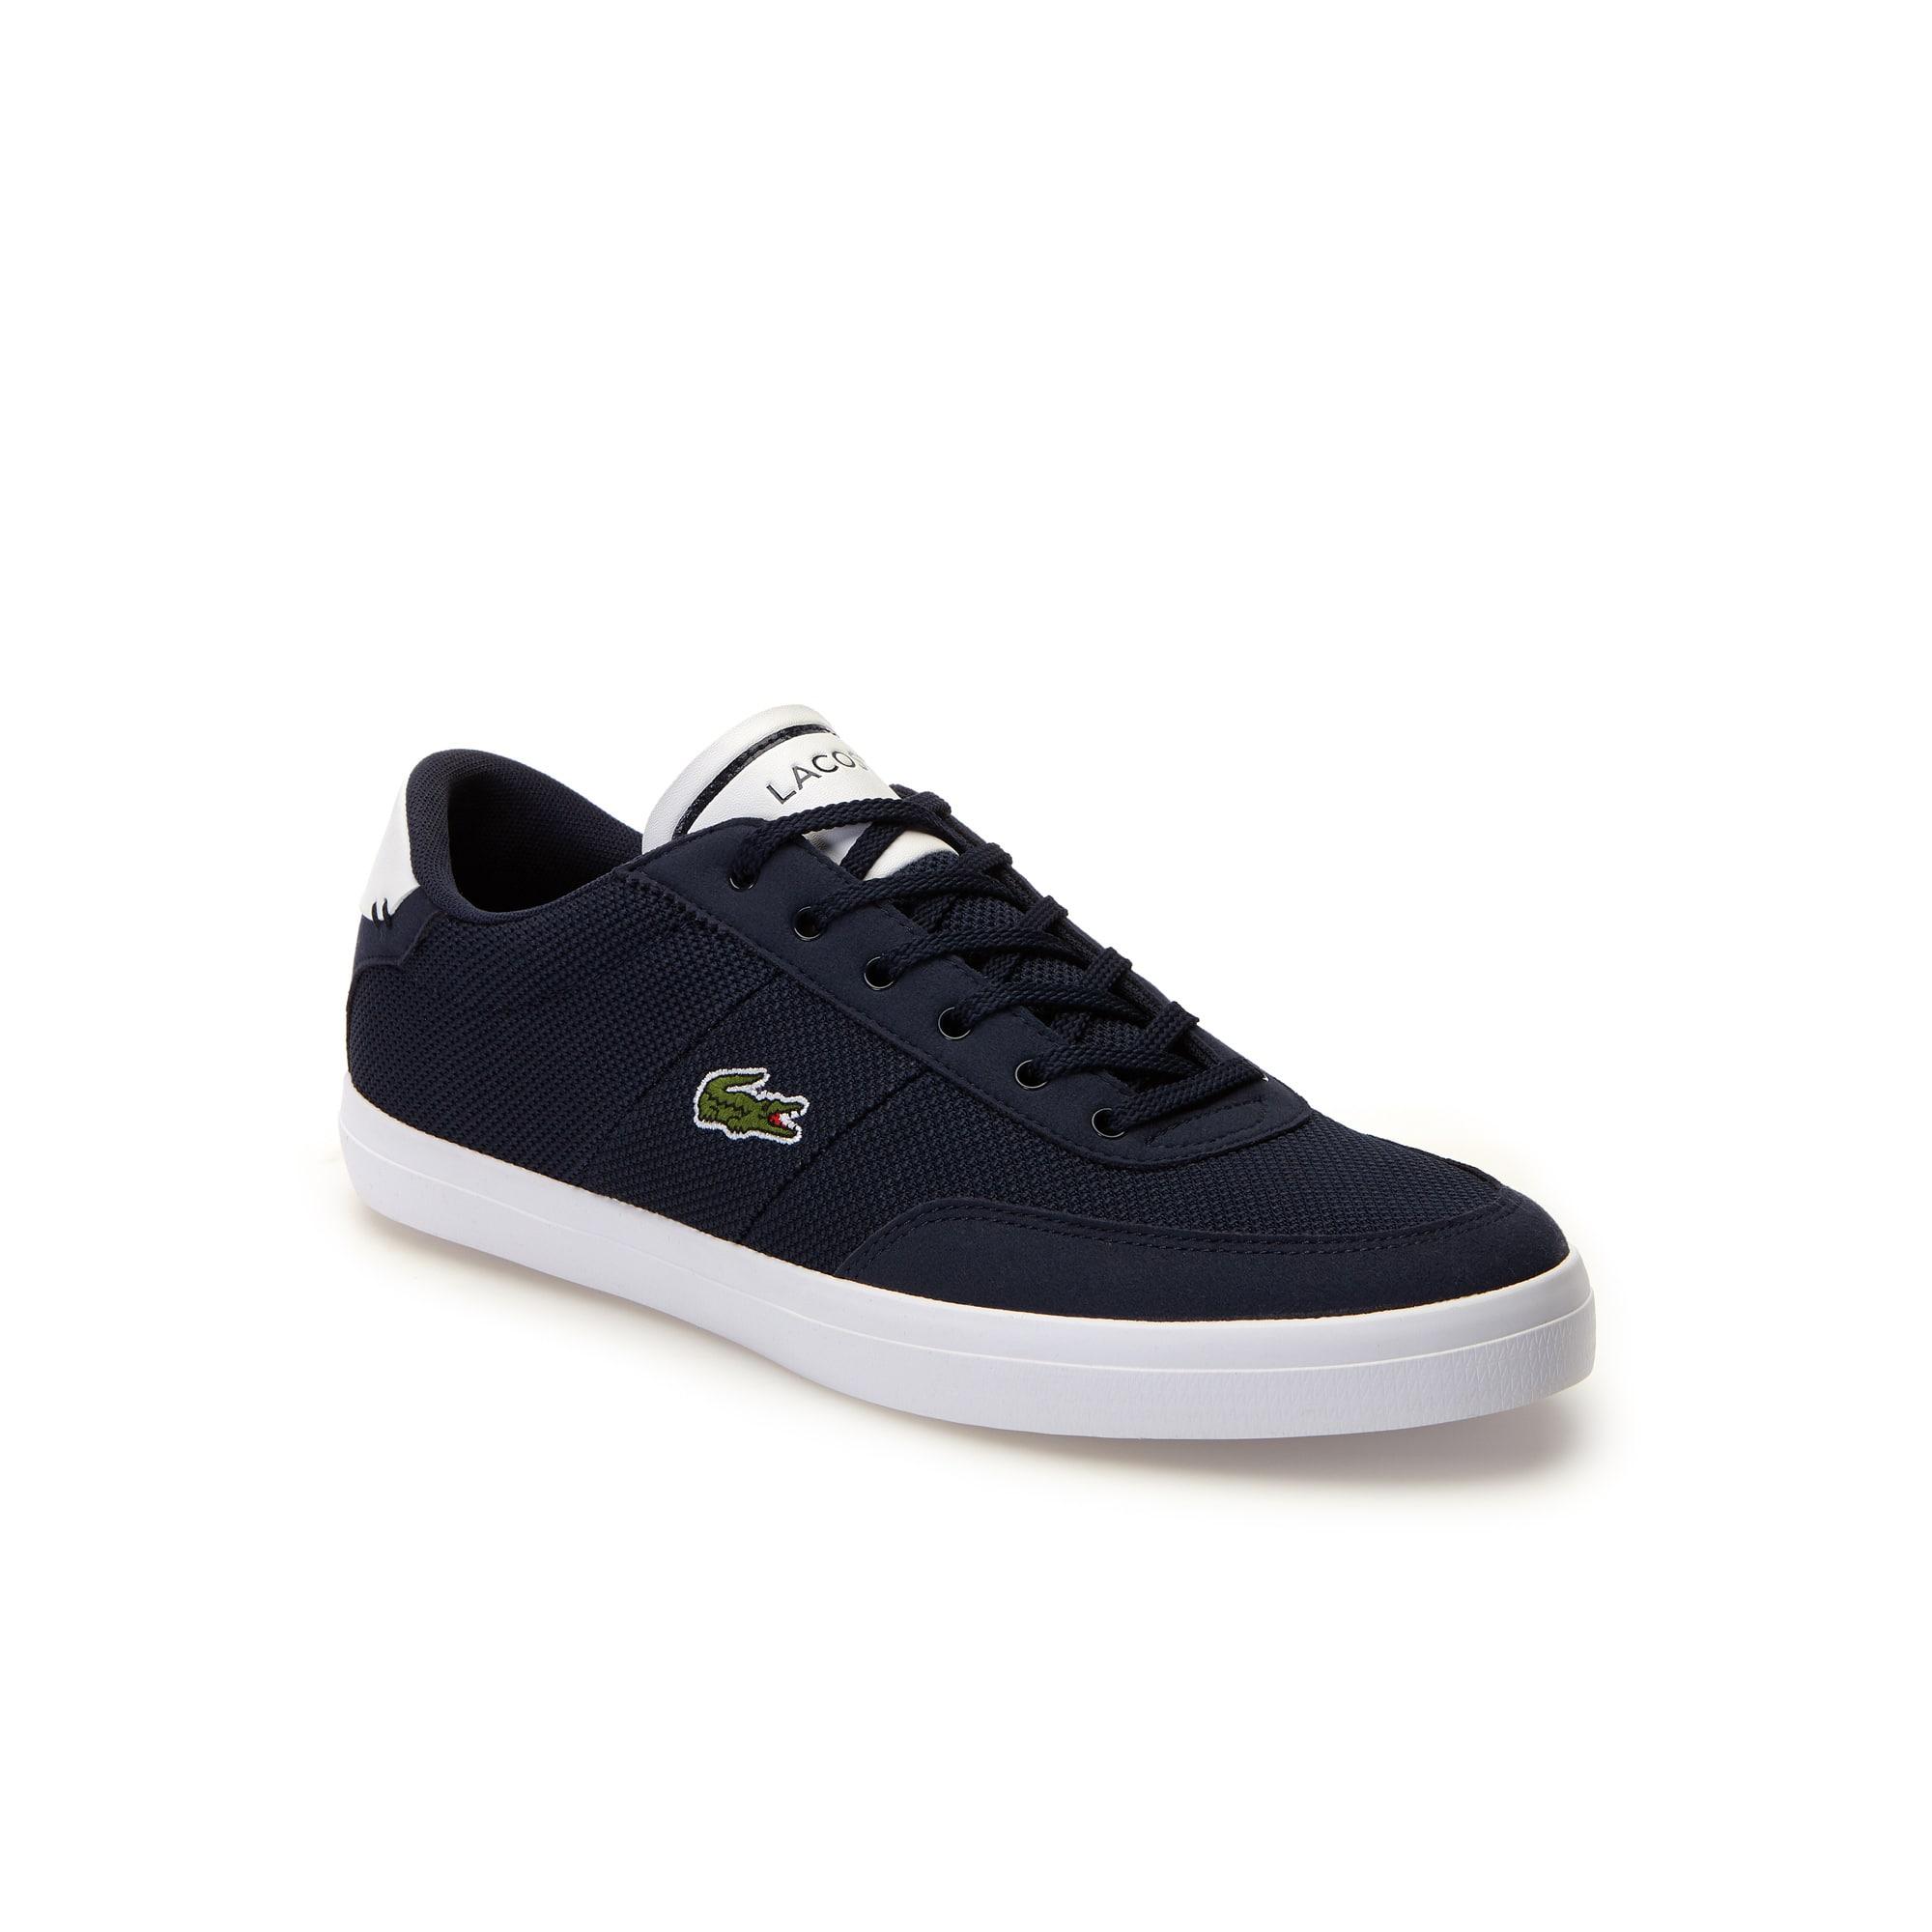 Herren-Sneakers COURT-MASTER aus Premium-Veloursleder